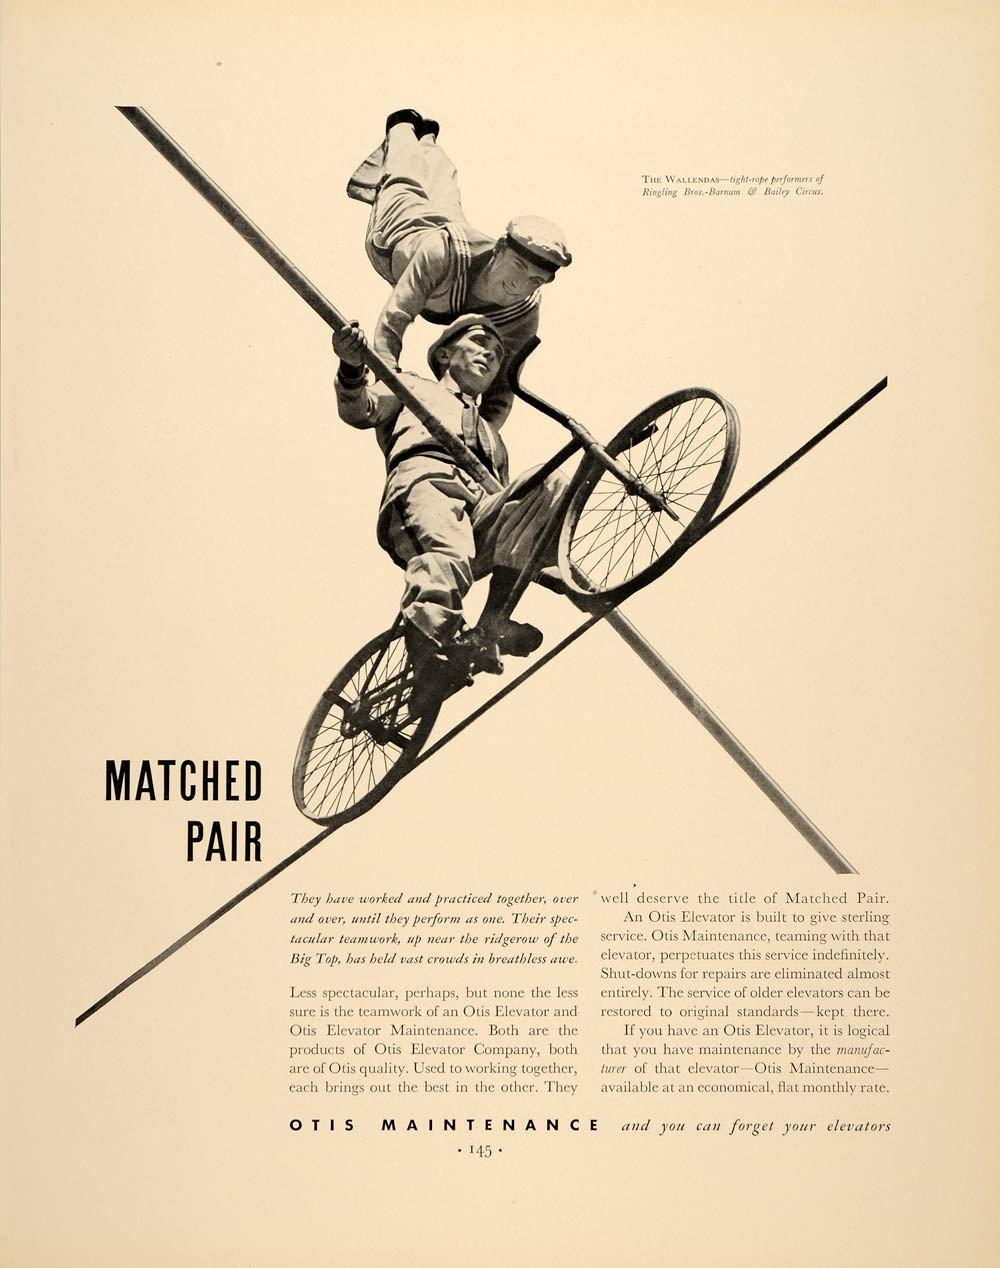 1937 Ad Ringling Brothers Otis Maintenance Elevators - ORIGINAL ADVERTISING FTT9 .jpg